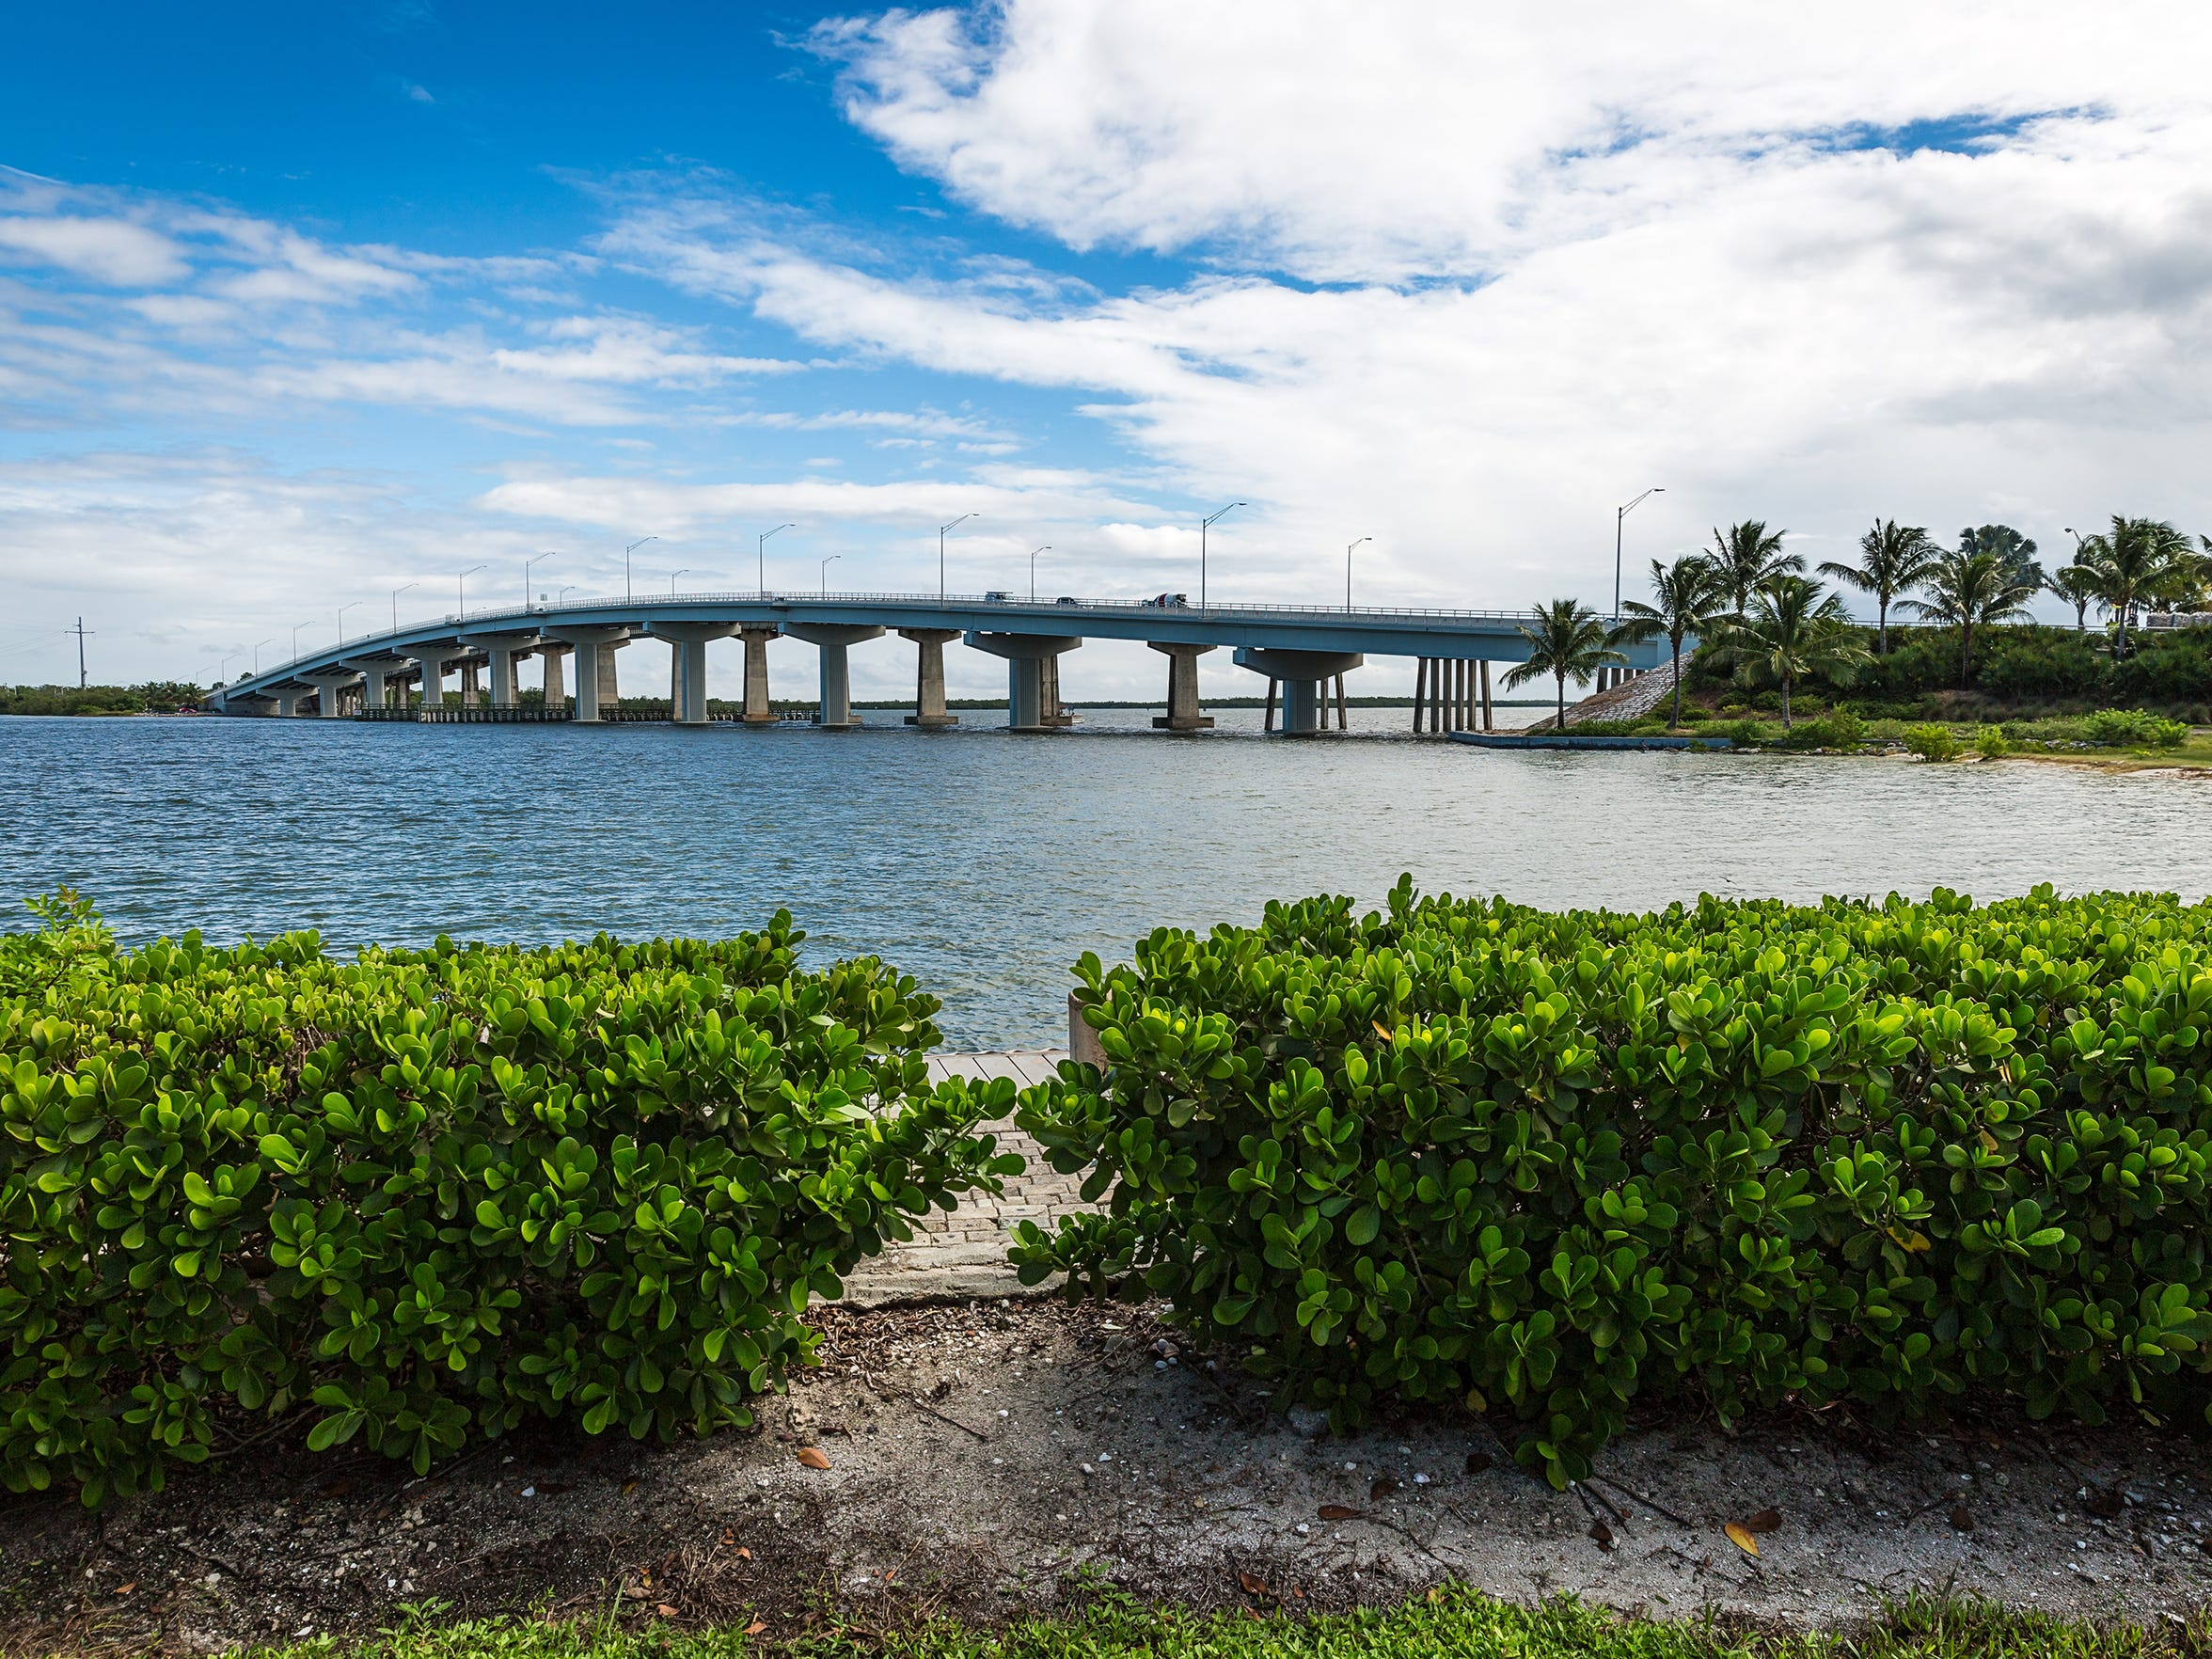 The S.S. Jolley Bridge on Wednesday, Oct. 7, 2015,